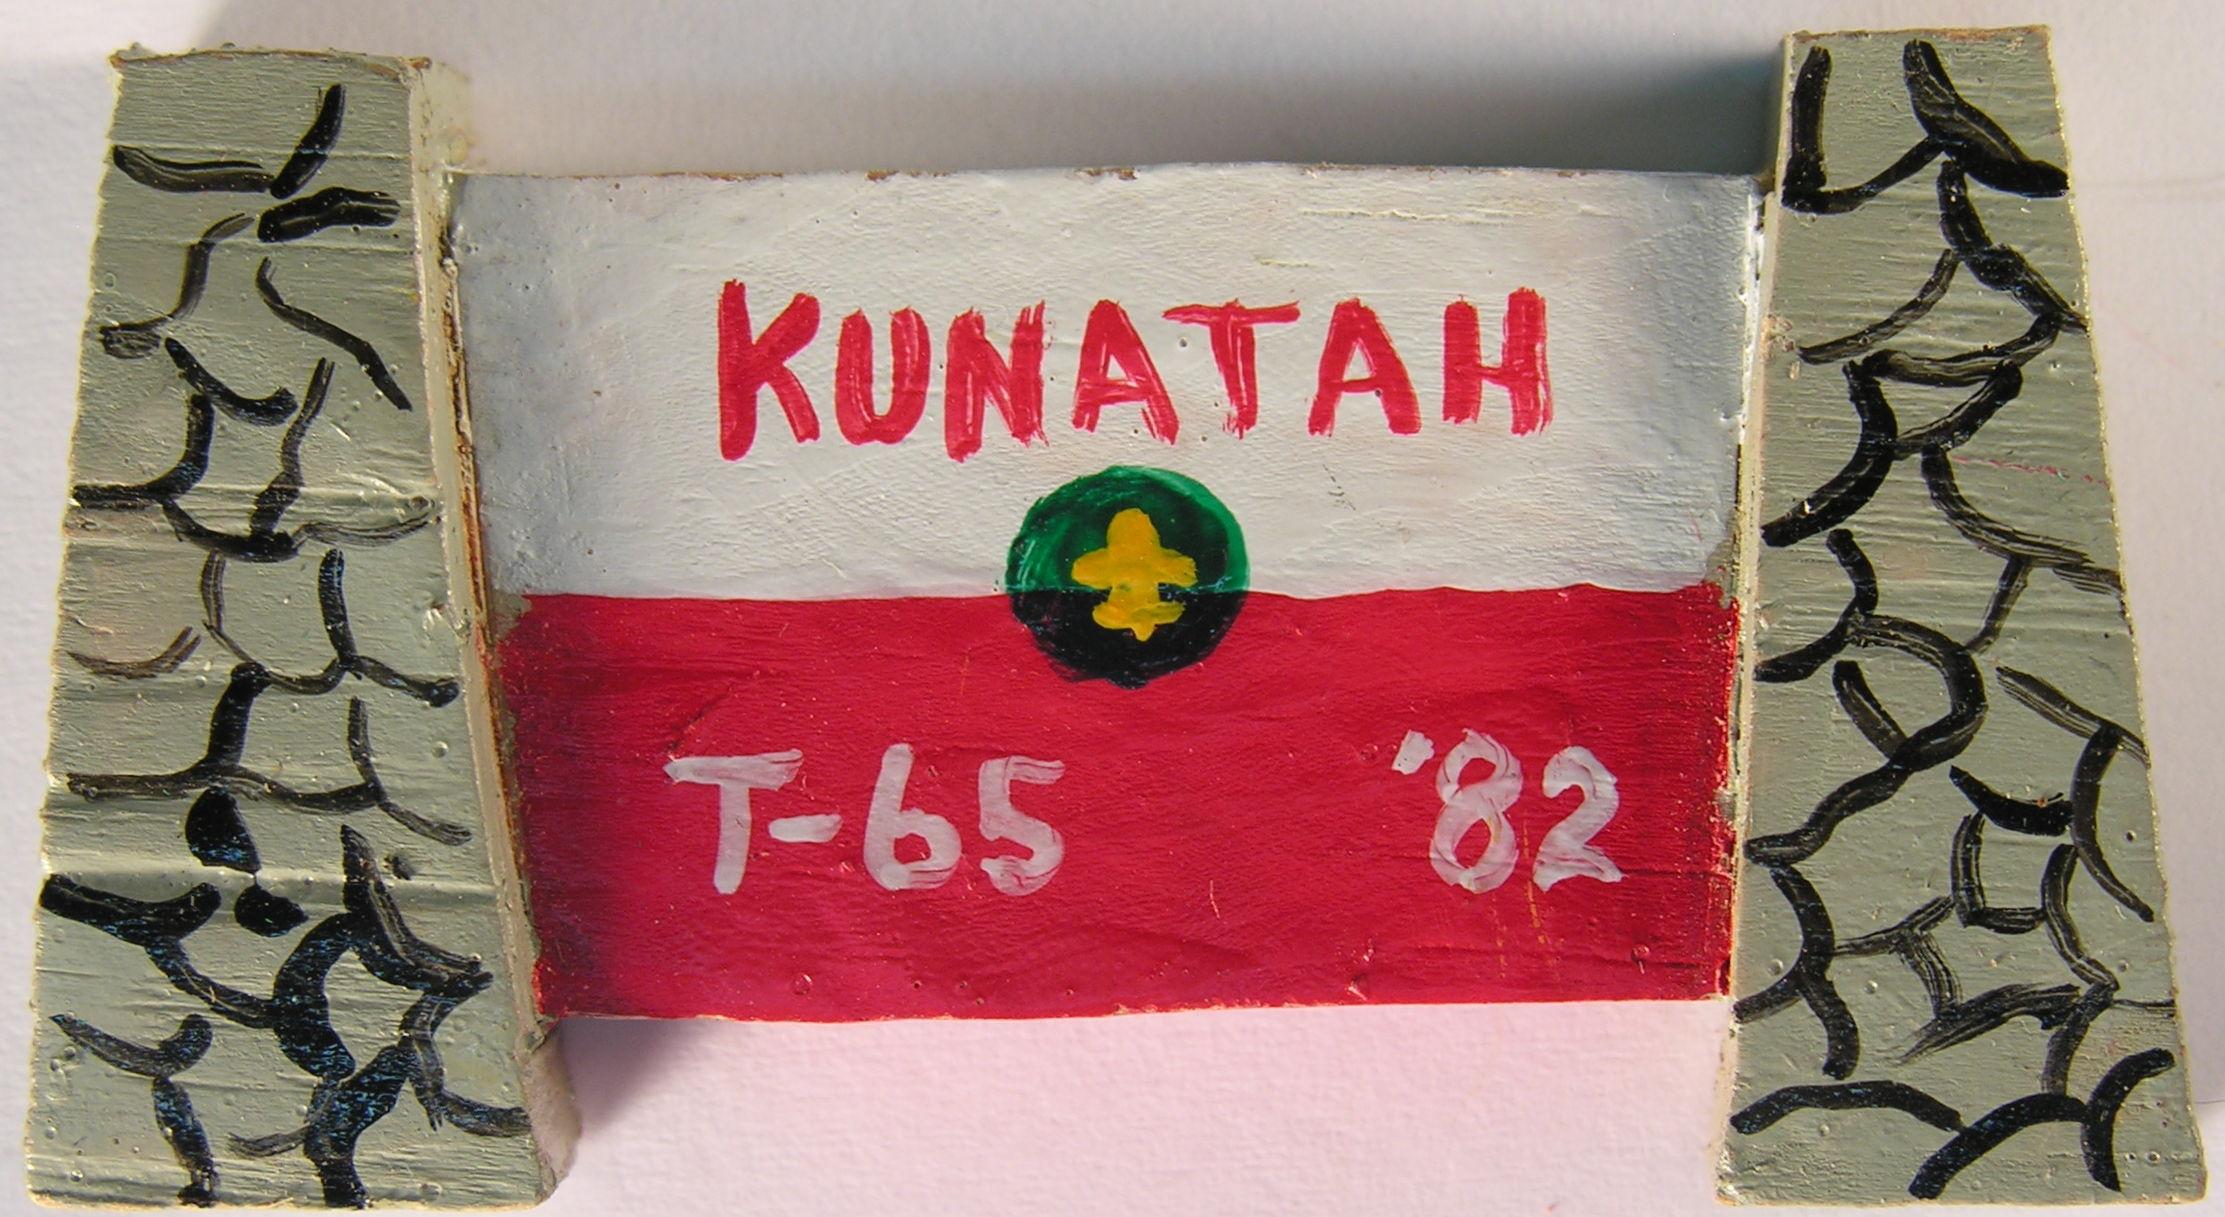 Camp Kunatah-16